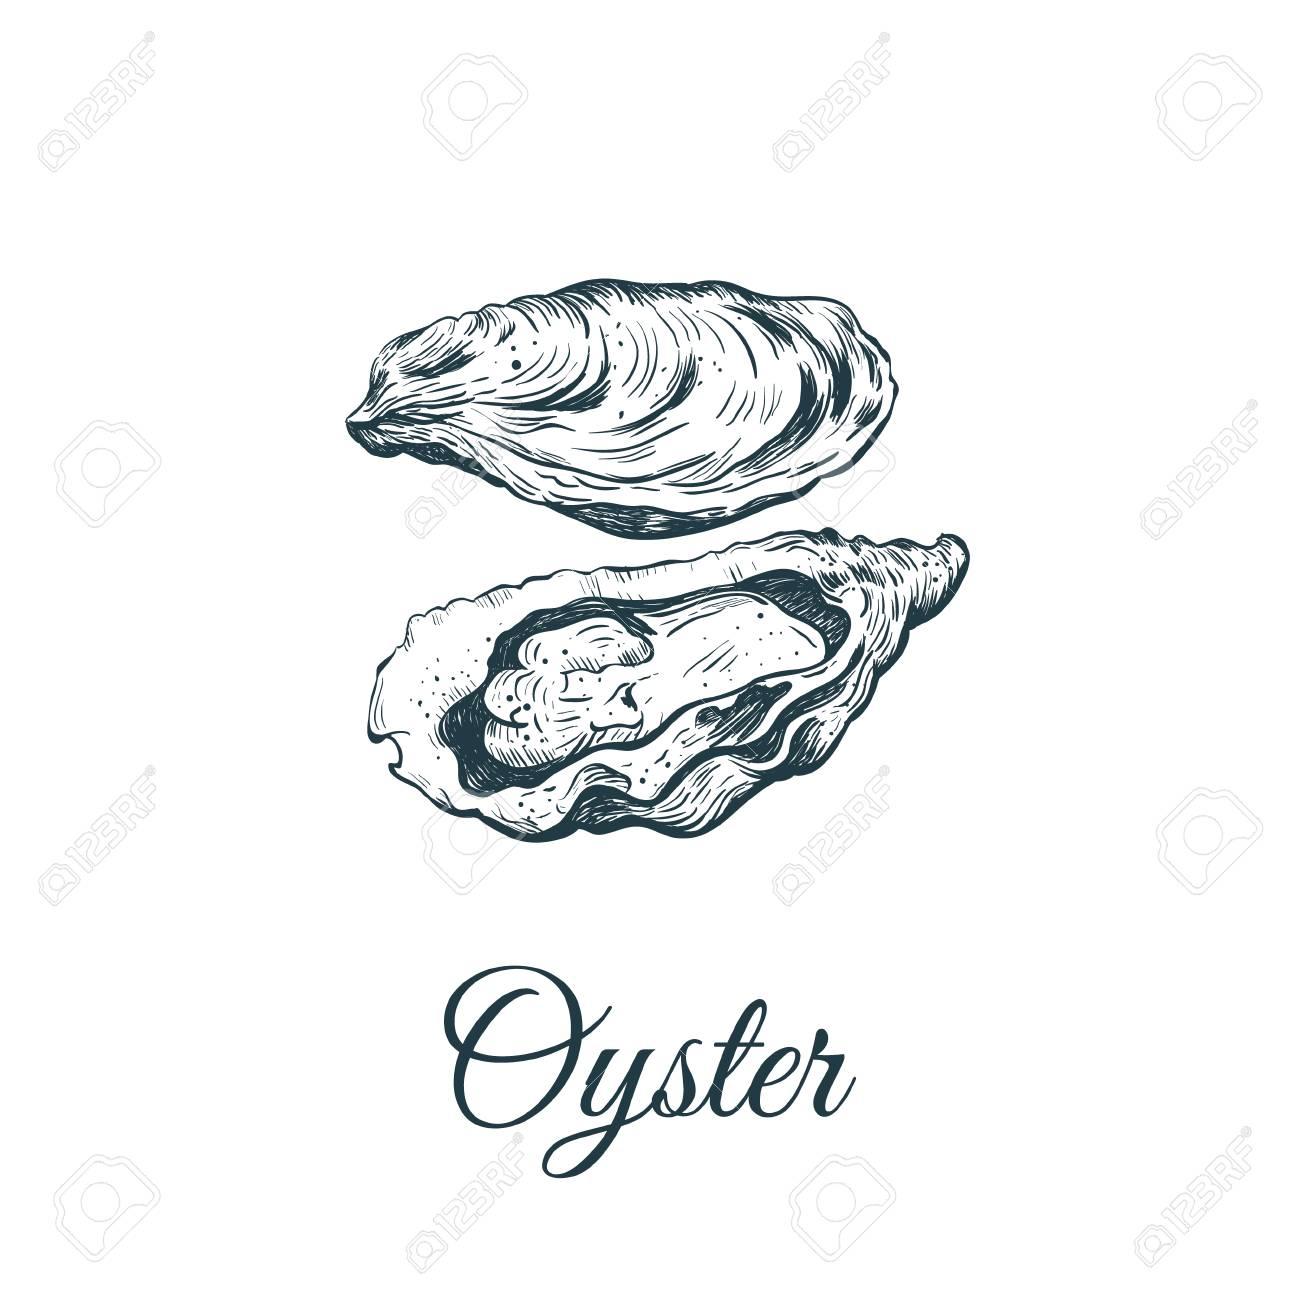 Oyster sketch vector illustration. oyster shell - 104120508